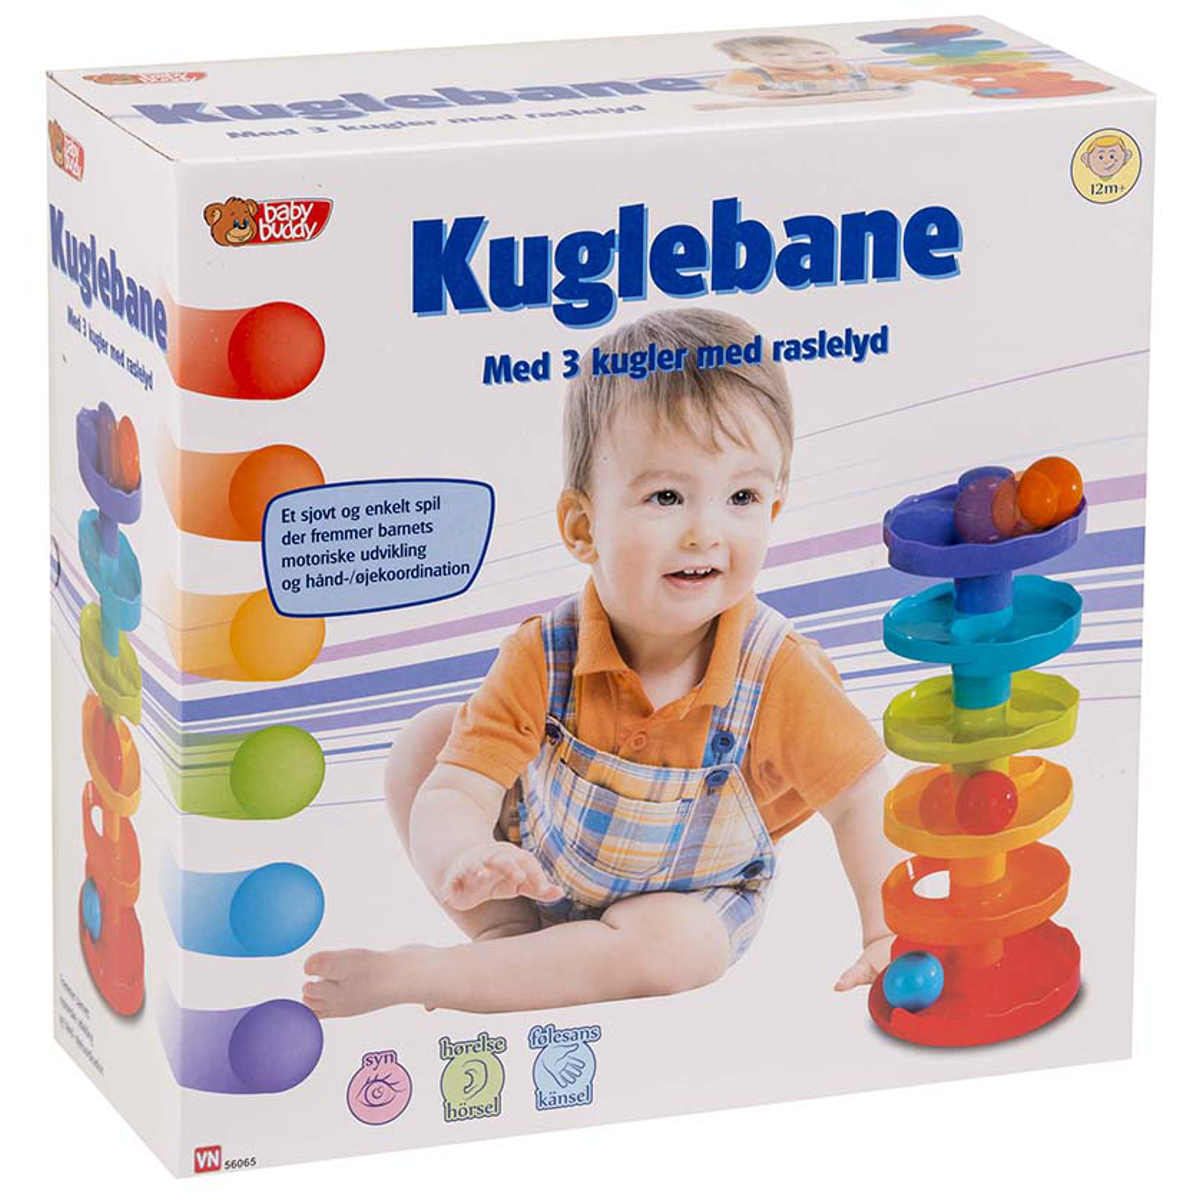 Baby Buddy kuglebane